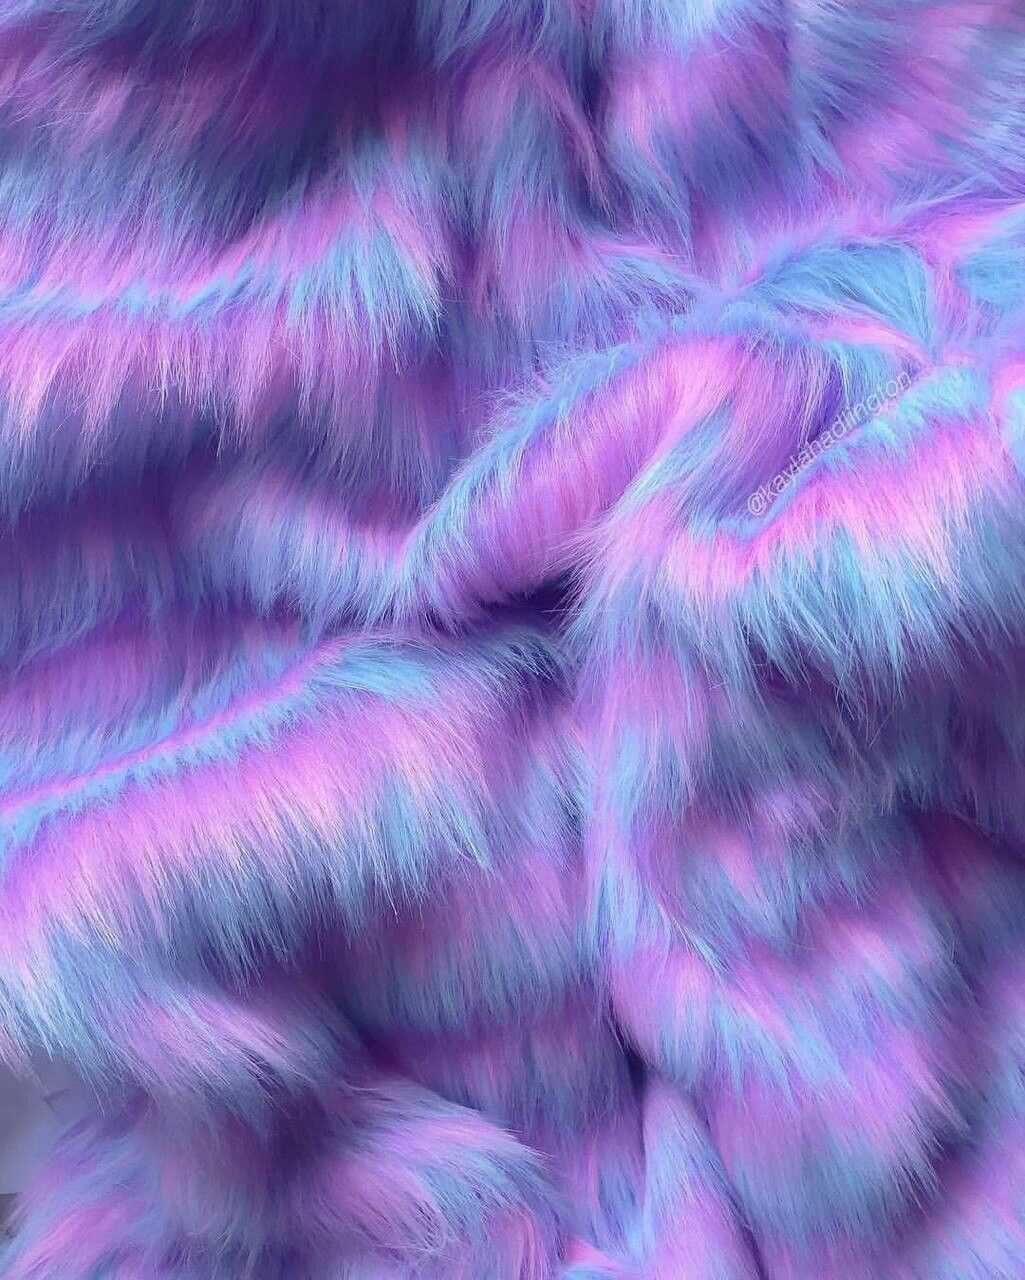 Pastel Pastello 淡色の Pastelnyj Color Texture Pattern Composition Purple Aesthetic Iphone Background Wallpaper Purple Wallpaper